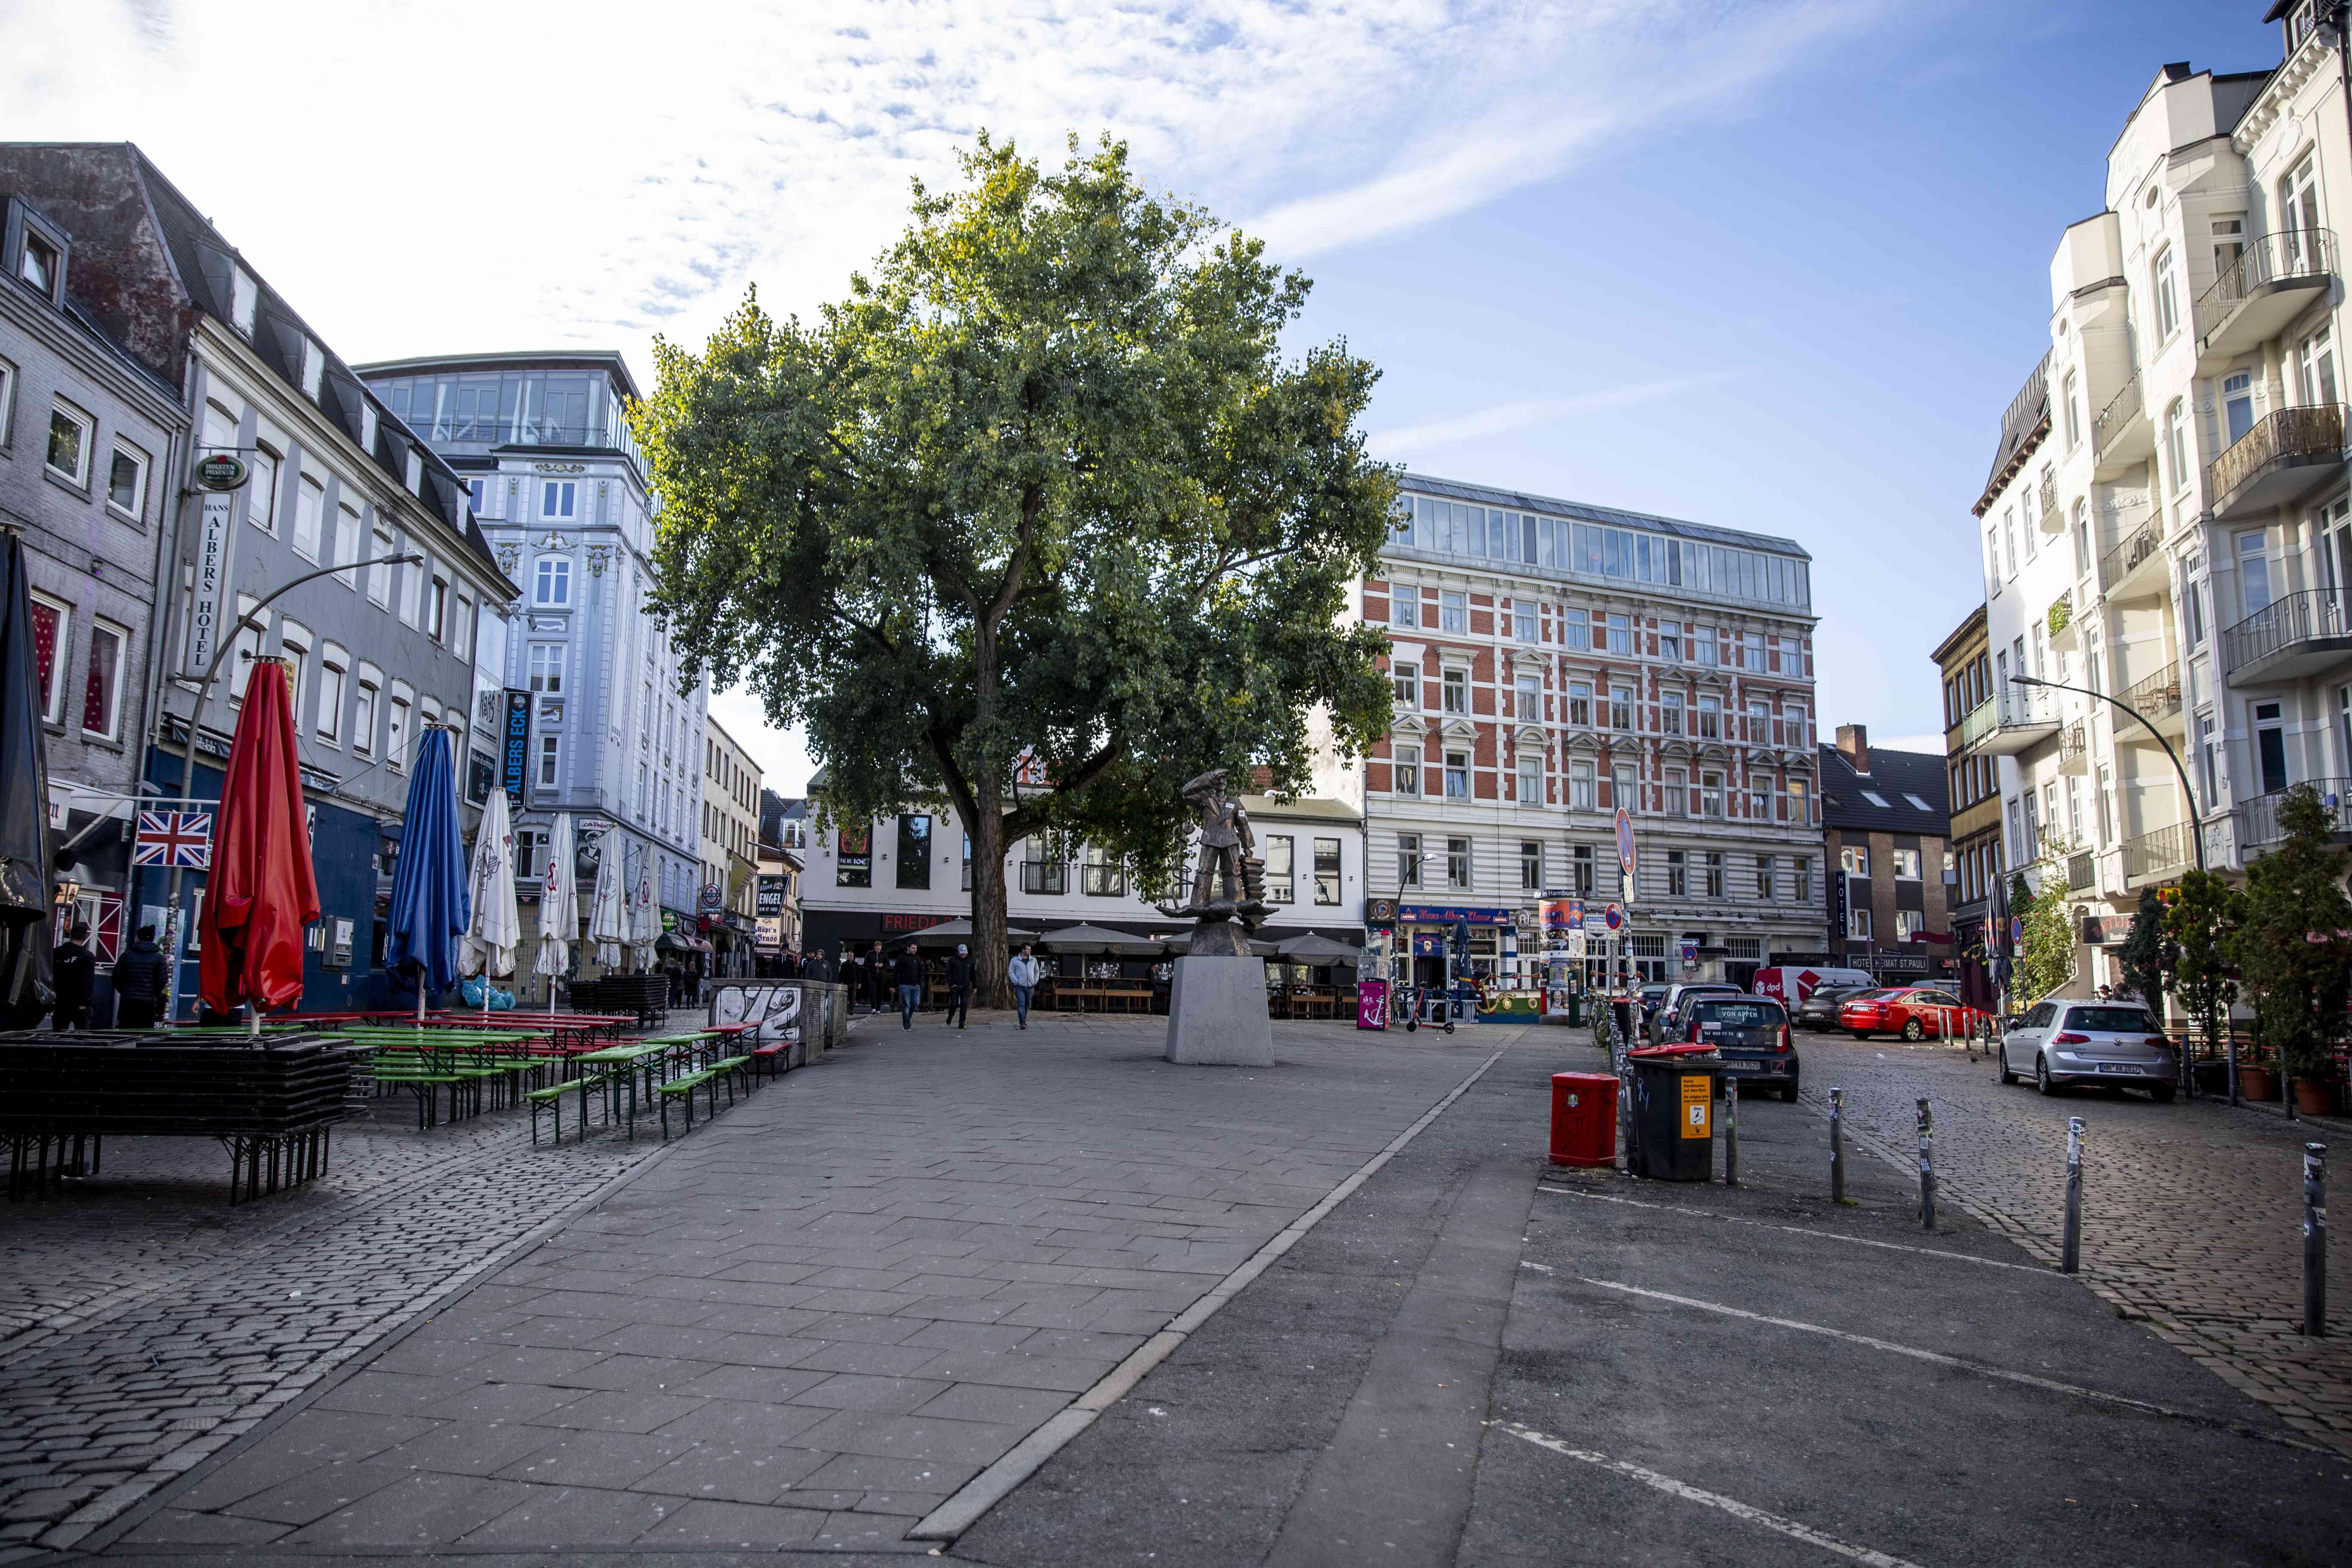 Square in the Reeperbahn